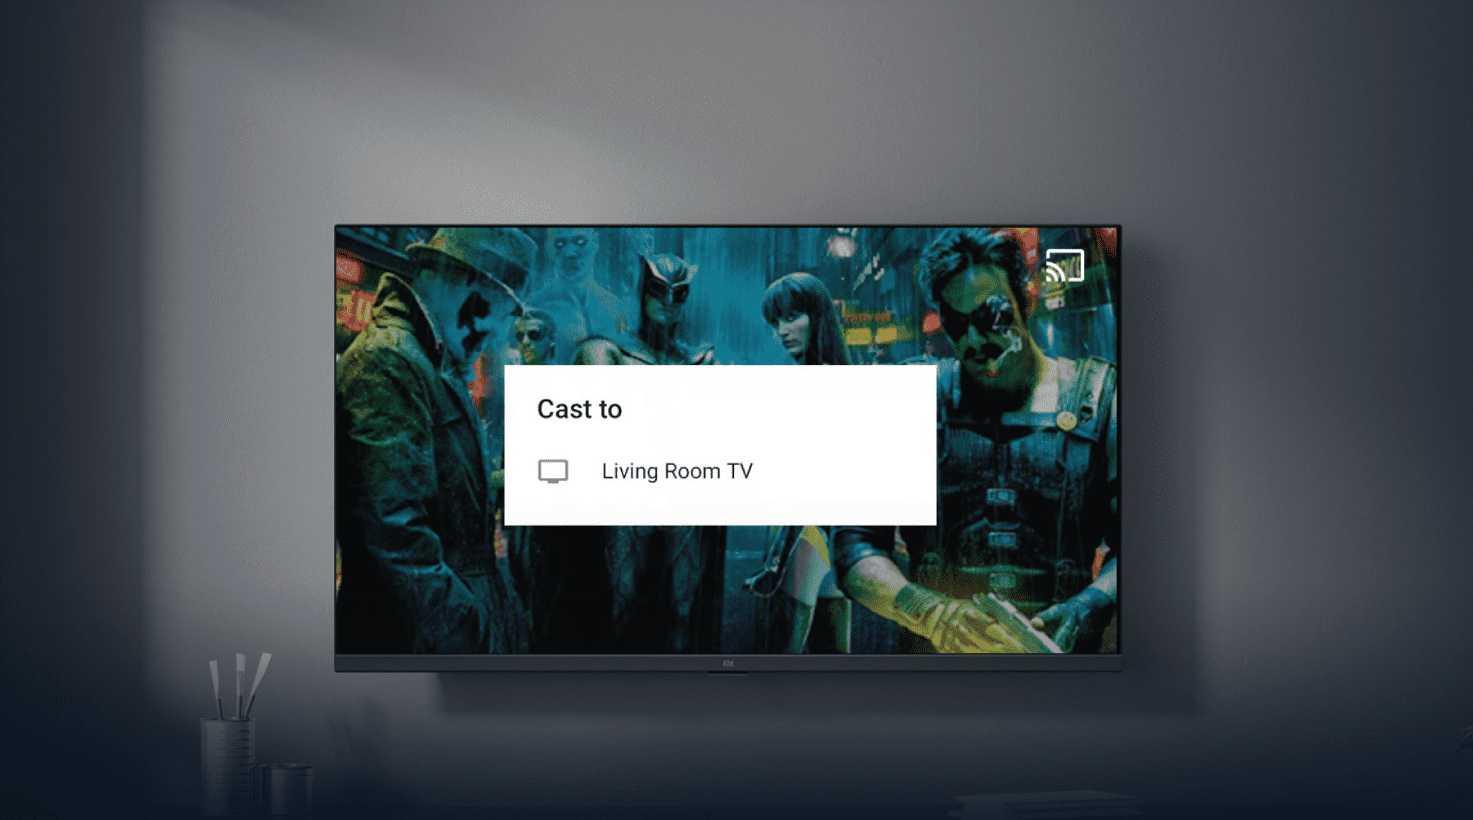 MI TV Chromecast